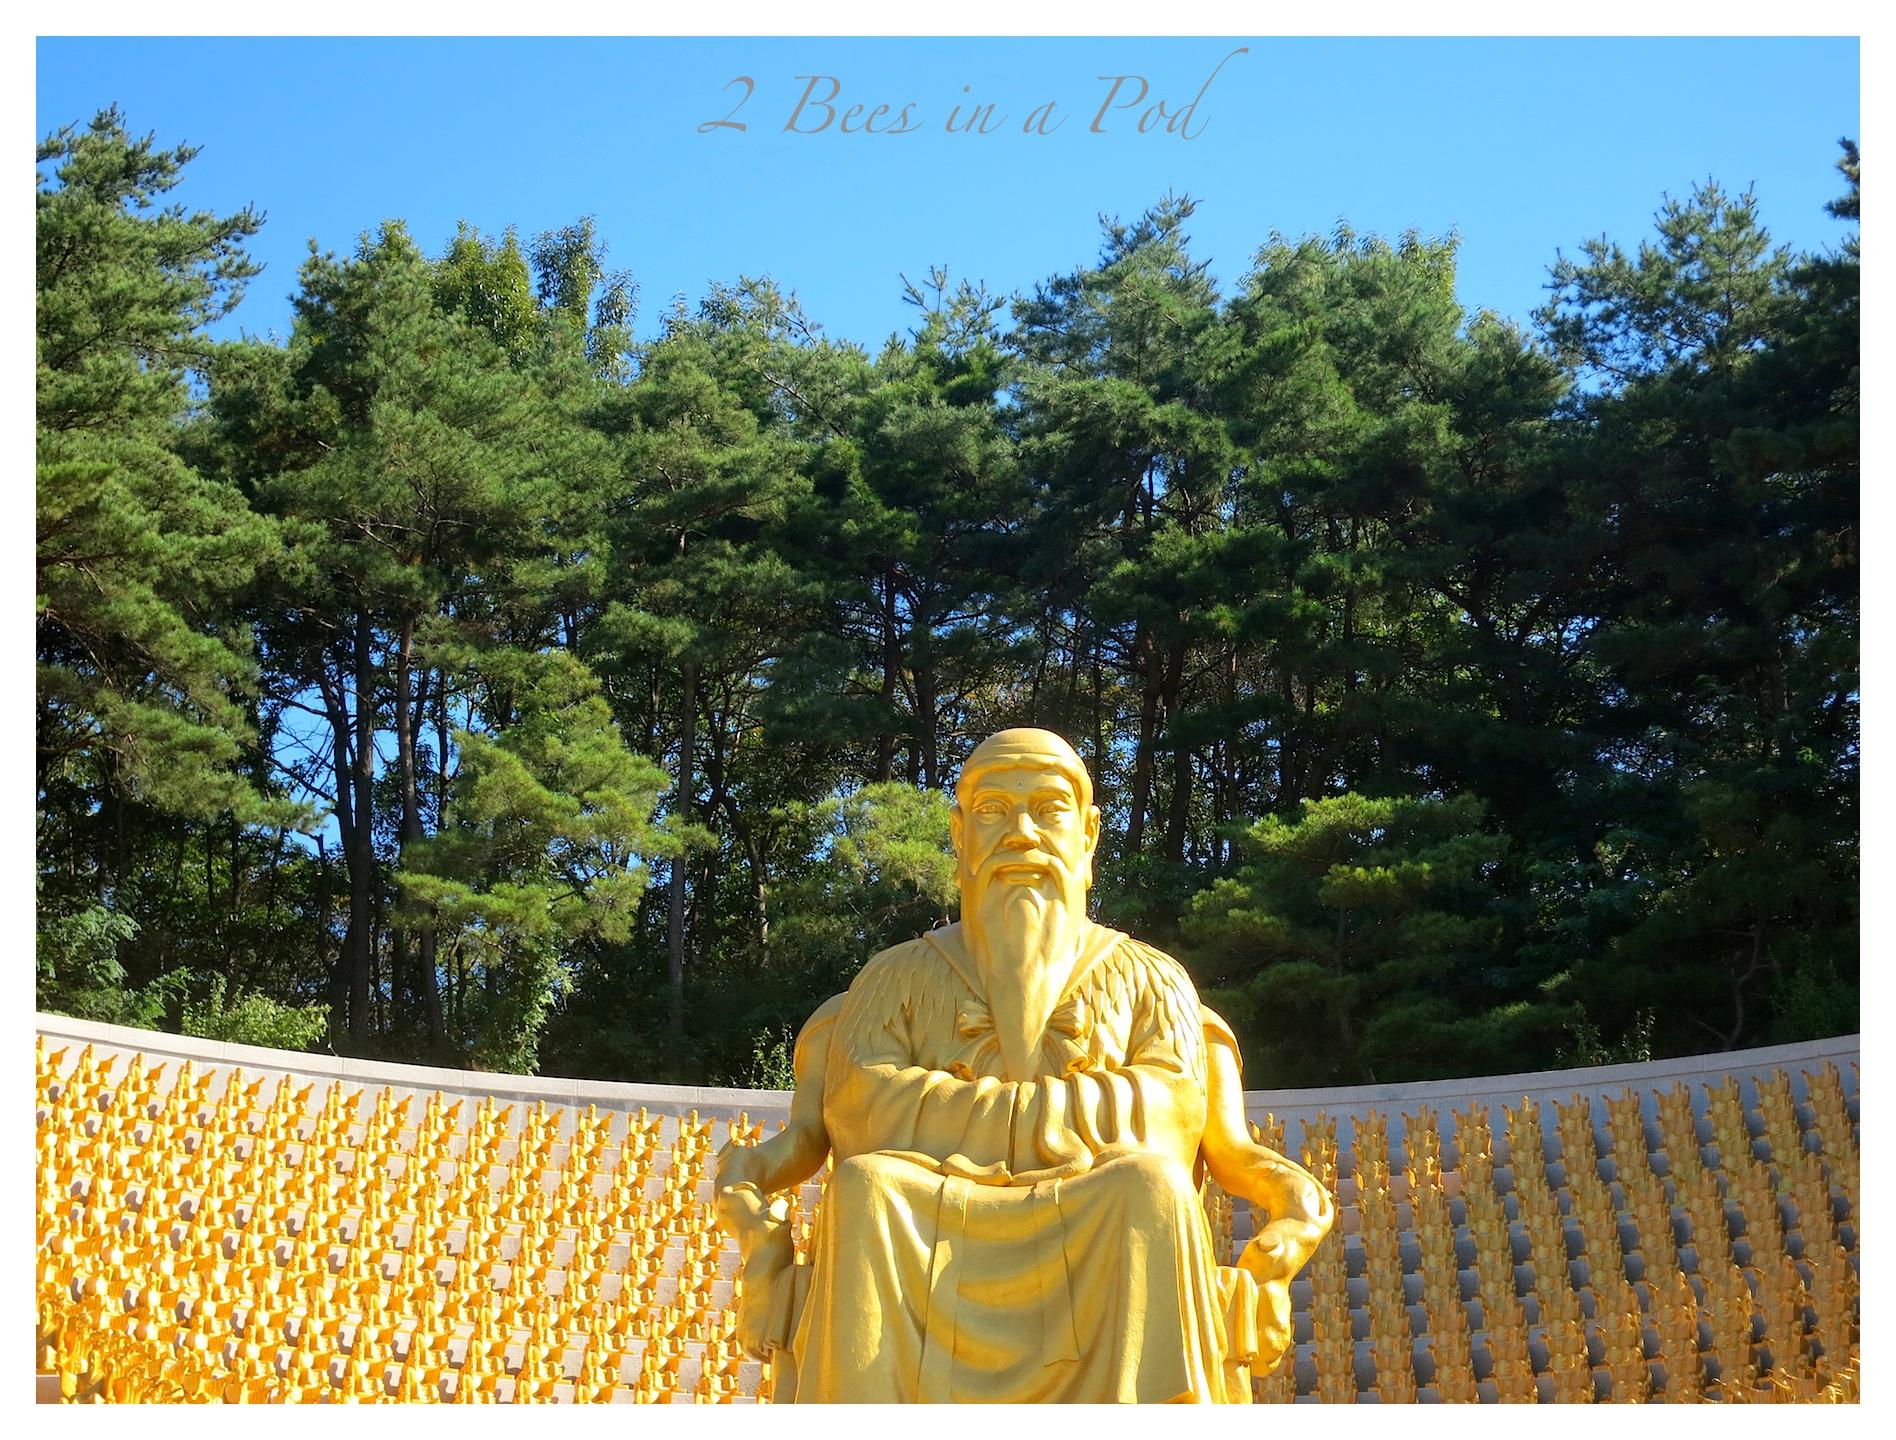 We saw Gold statues Korea throughout South Korea